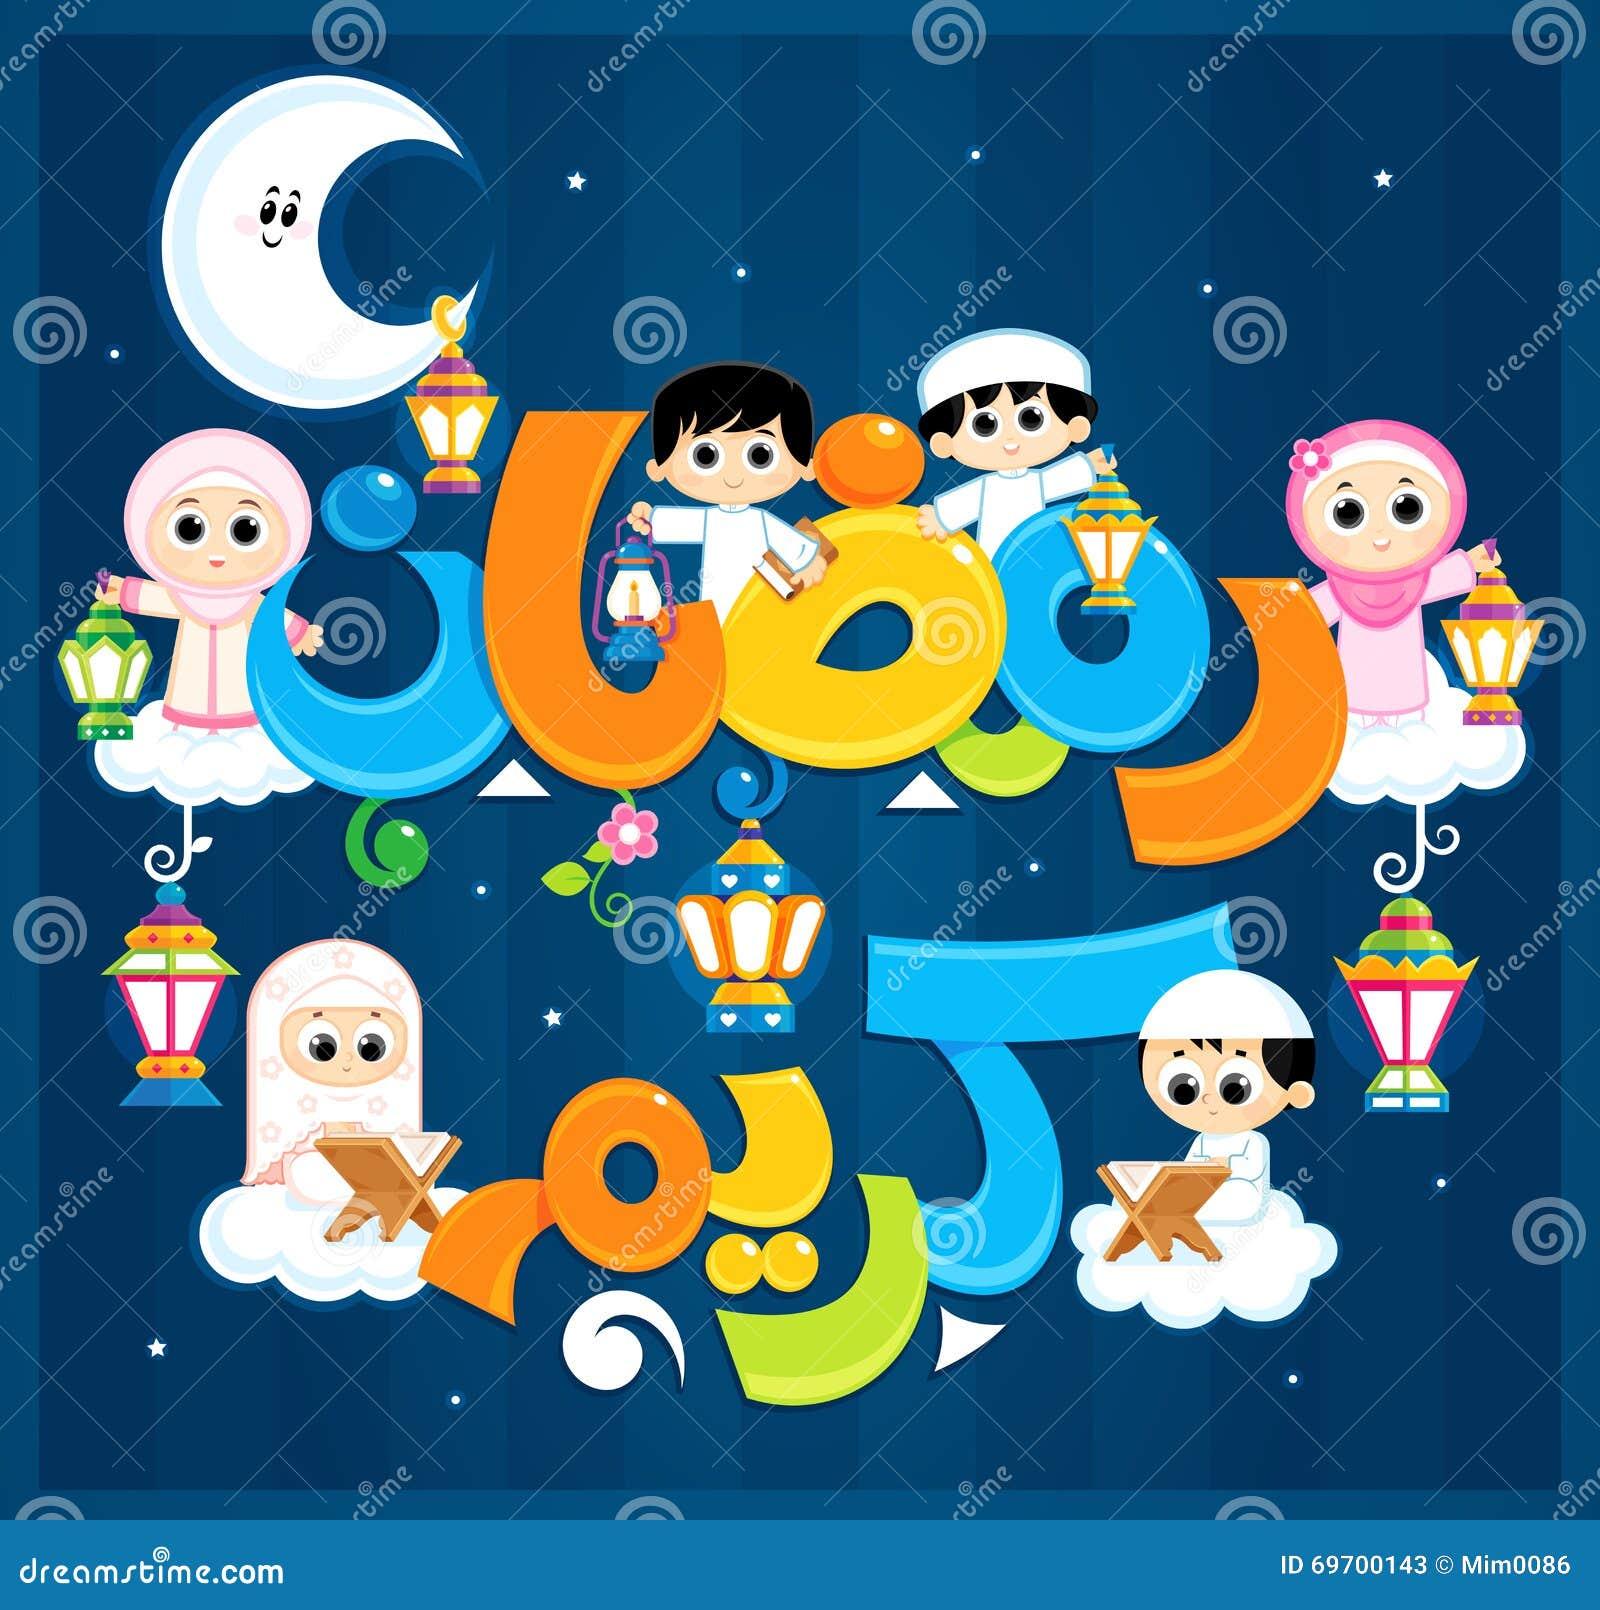 ramadan is the ninth month of the islamic calendar essay Essay on important religious festivals of islam ramadan is the ninth month of the islamic calendar the last friday during the month of ramadan.